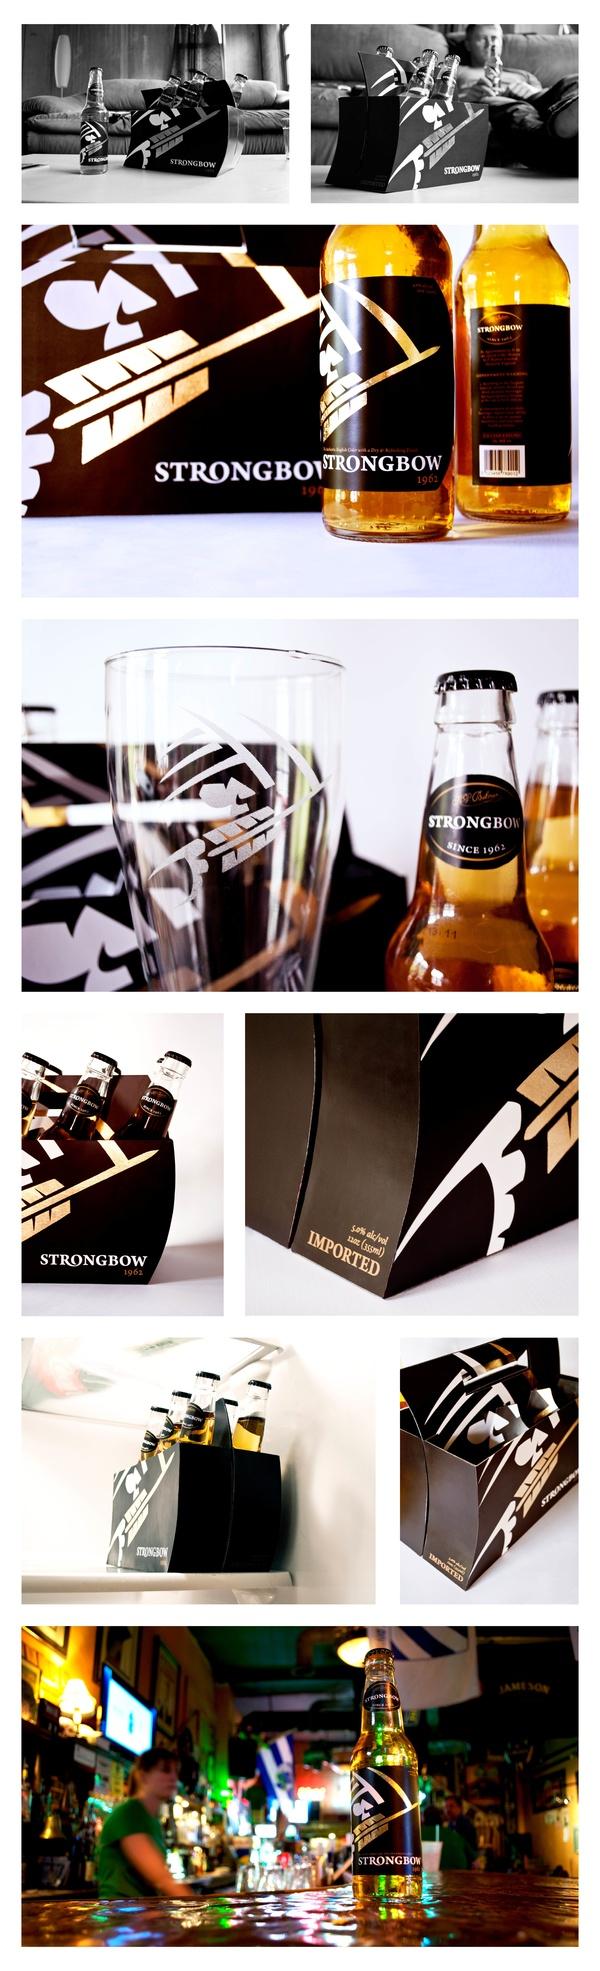 Strongbow graphic design industrial design packaging for Industrial design packaging